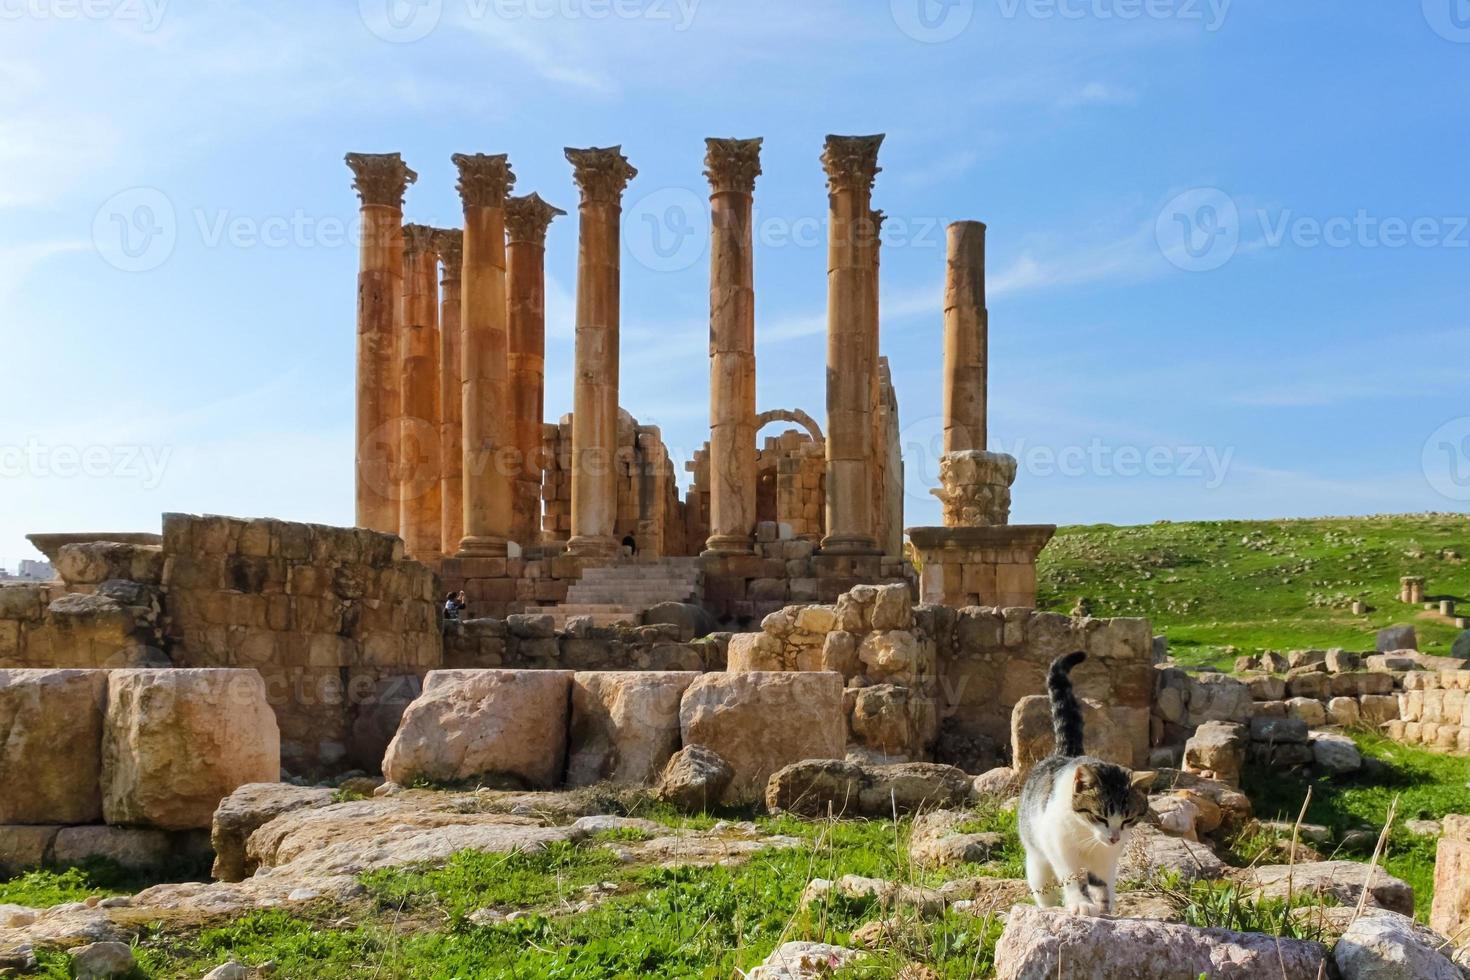 Zuid-theater, Romeinse ruïnes in de stad Jerash foto